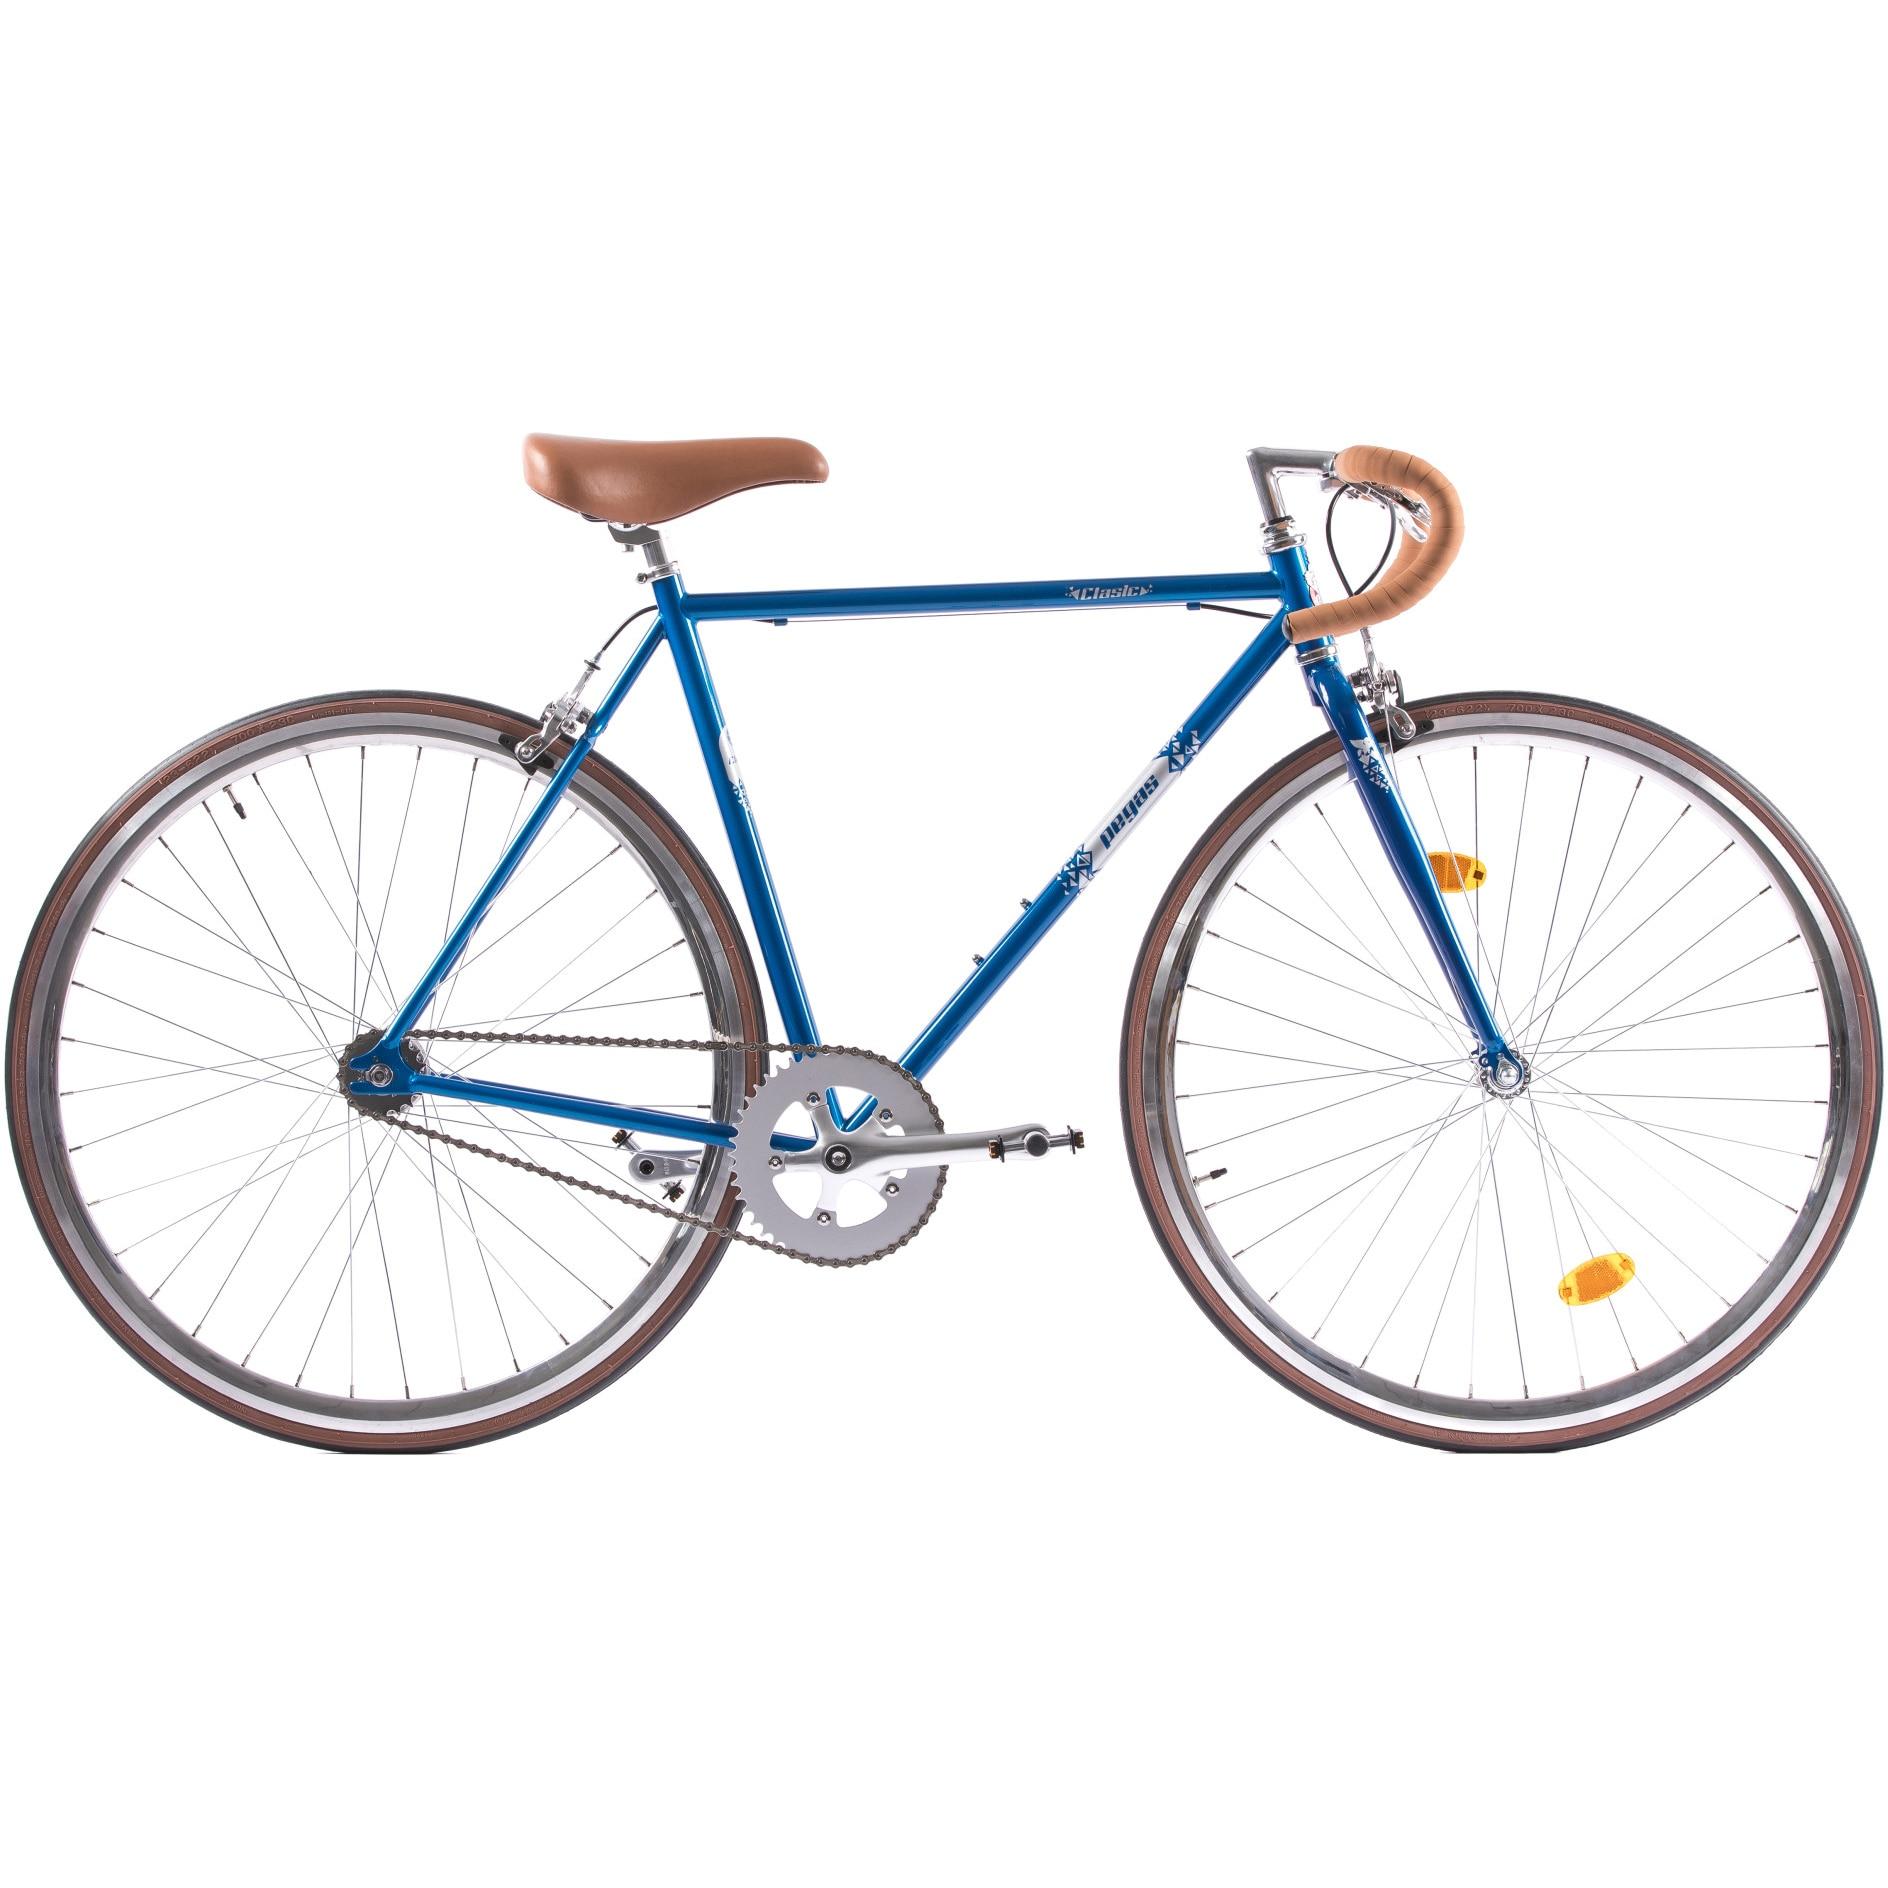 Fotografie Bicicleta Pegas Clasic 2S, Drop Man, 54cm, Bleu